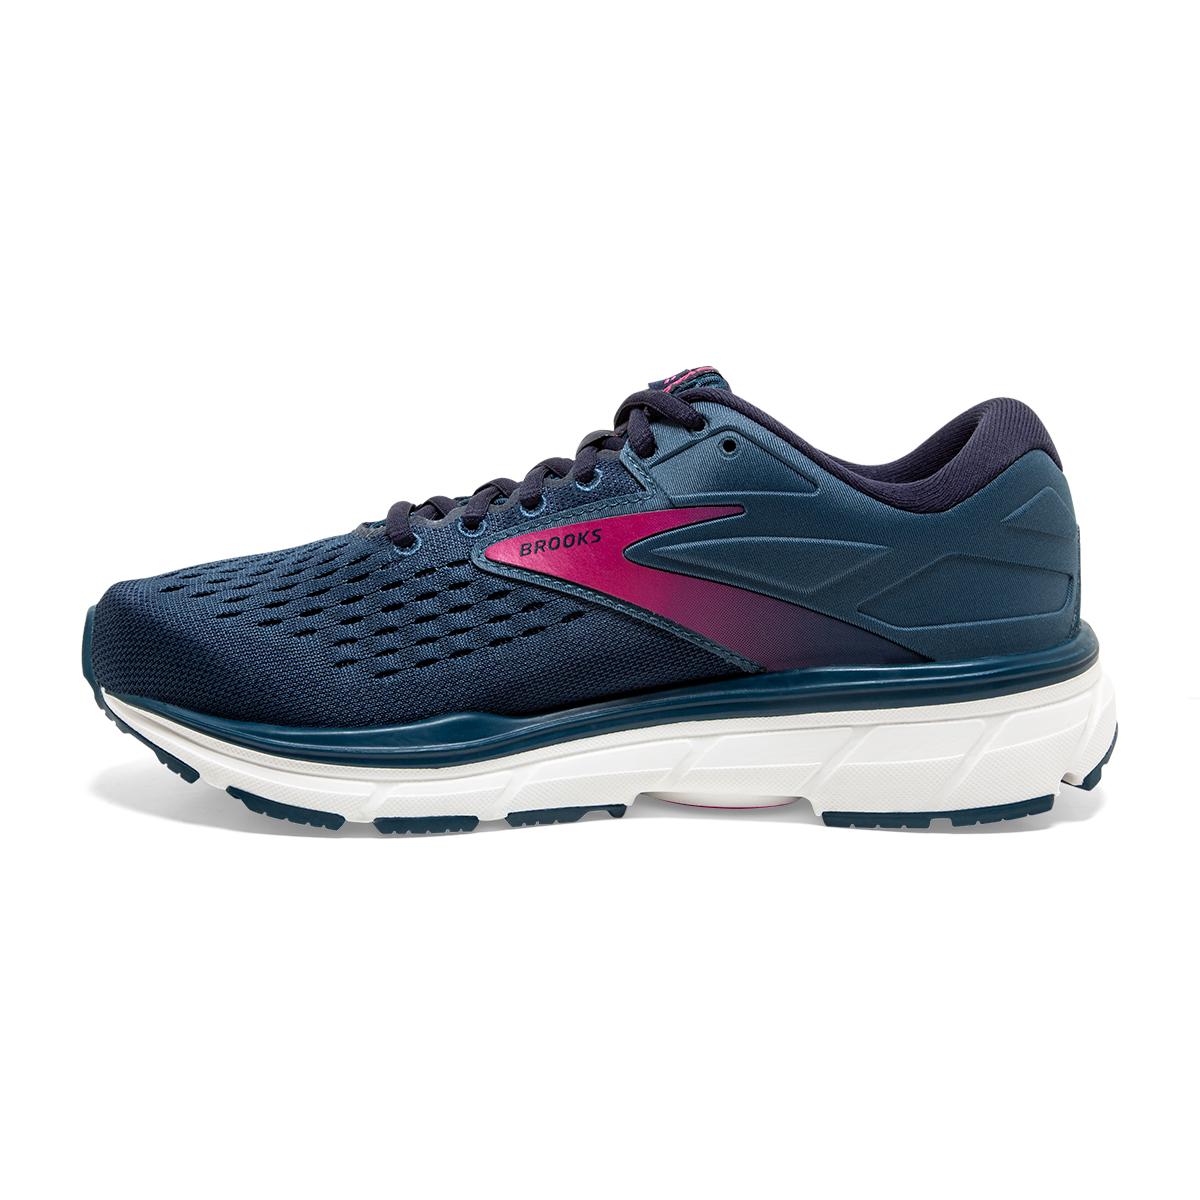 Women's Brooks Dyad 11 Running Shoe - Color: Blue/Navy/Beetroot (Regular Width) - Size: 7.5, Blue/Navy/Beetroot, large, image 2